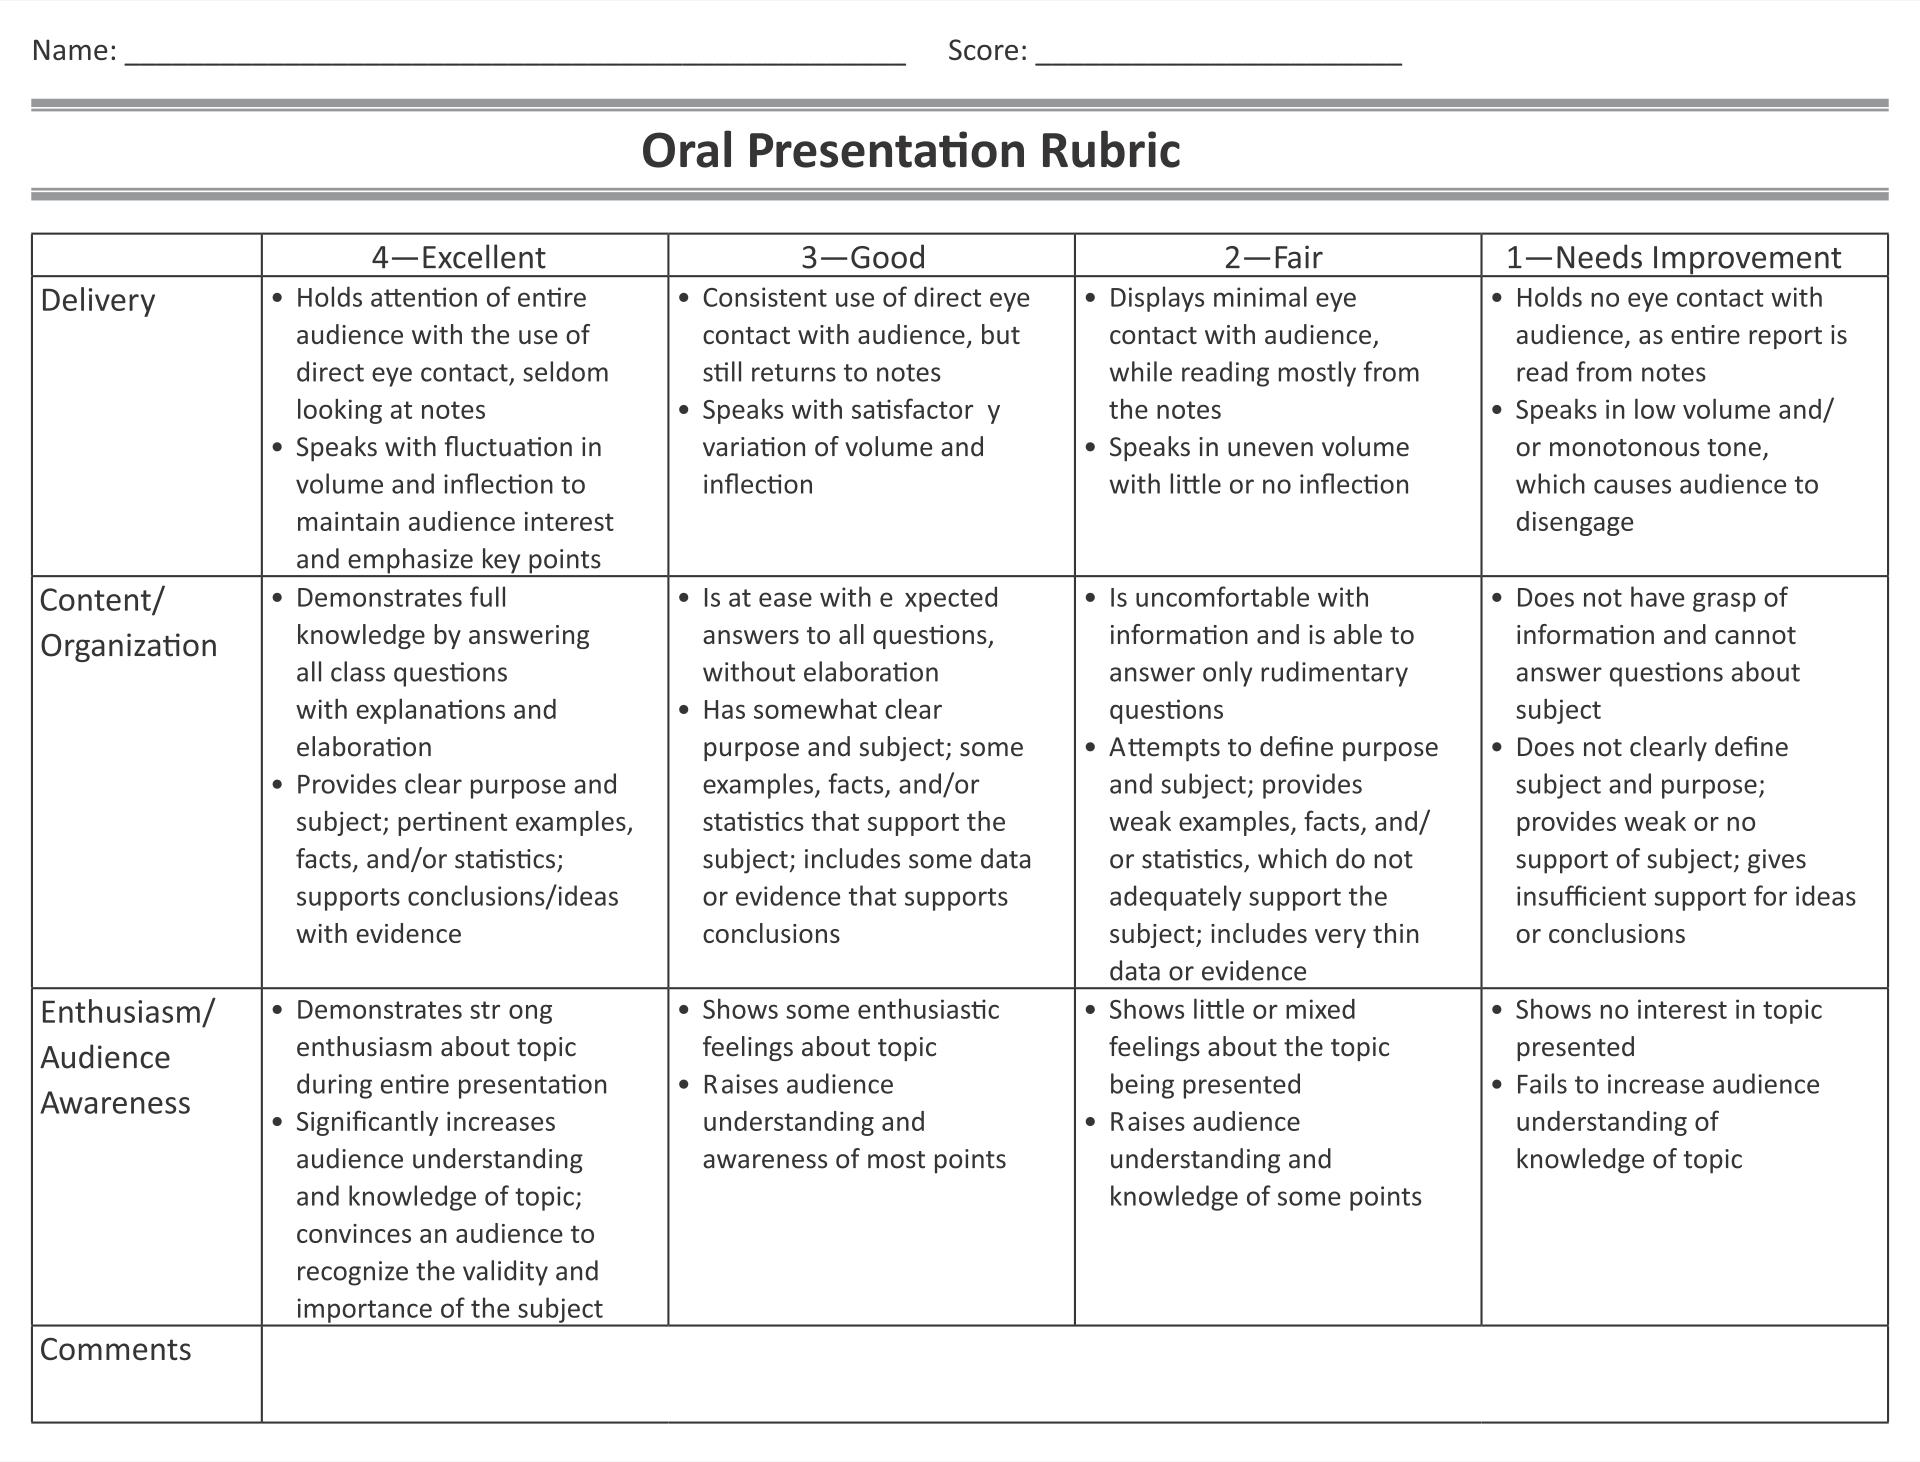 Analytic Rubrics For Oral Presentation